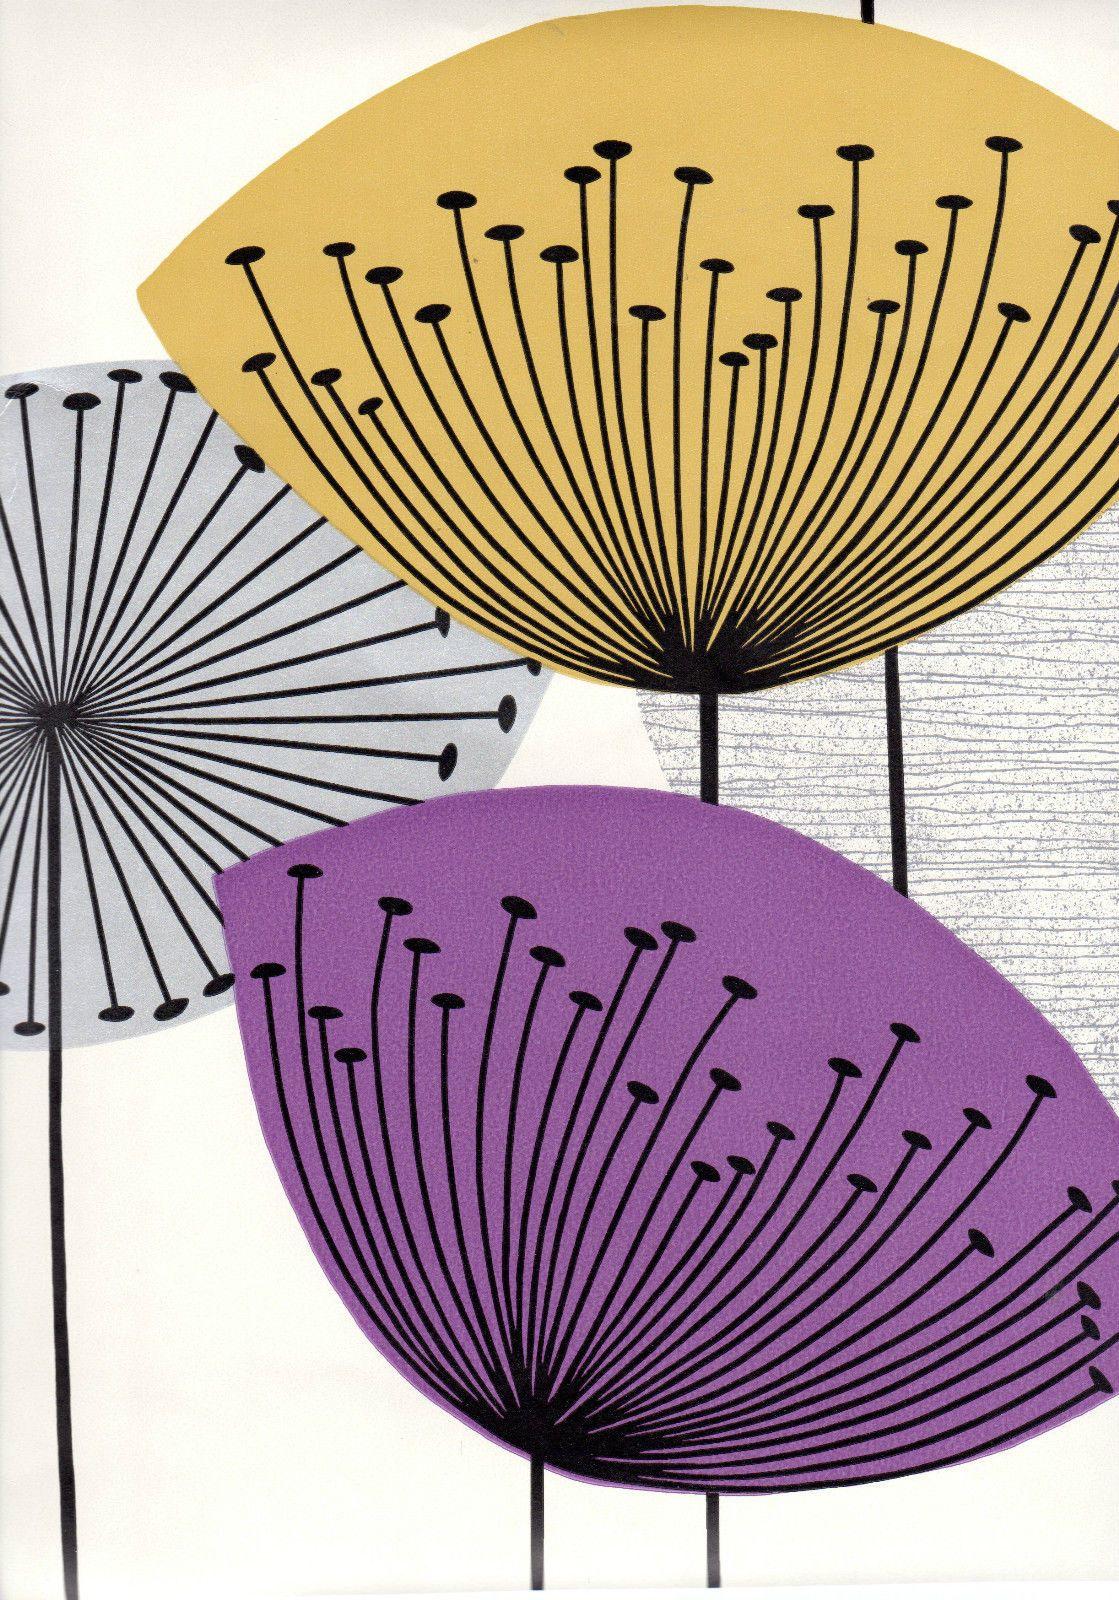 Sanderson Retro Mustard Purple Metallic Silver Dandelion Clock Wallpaper | eBay